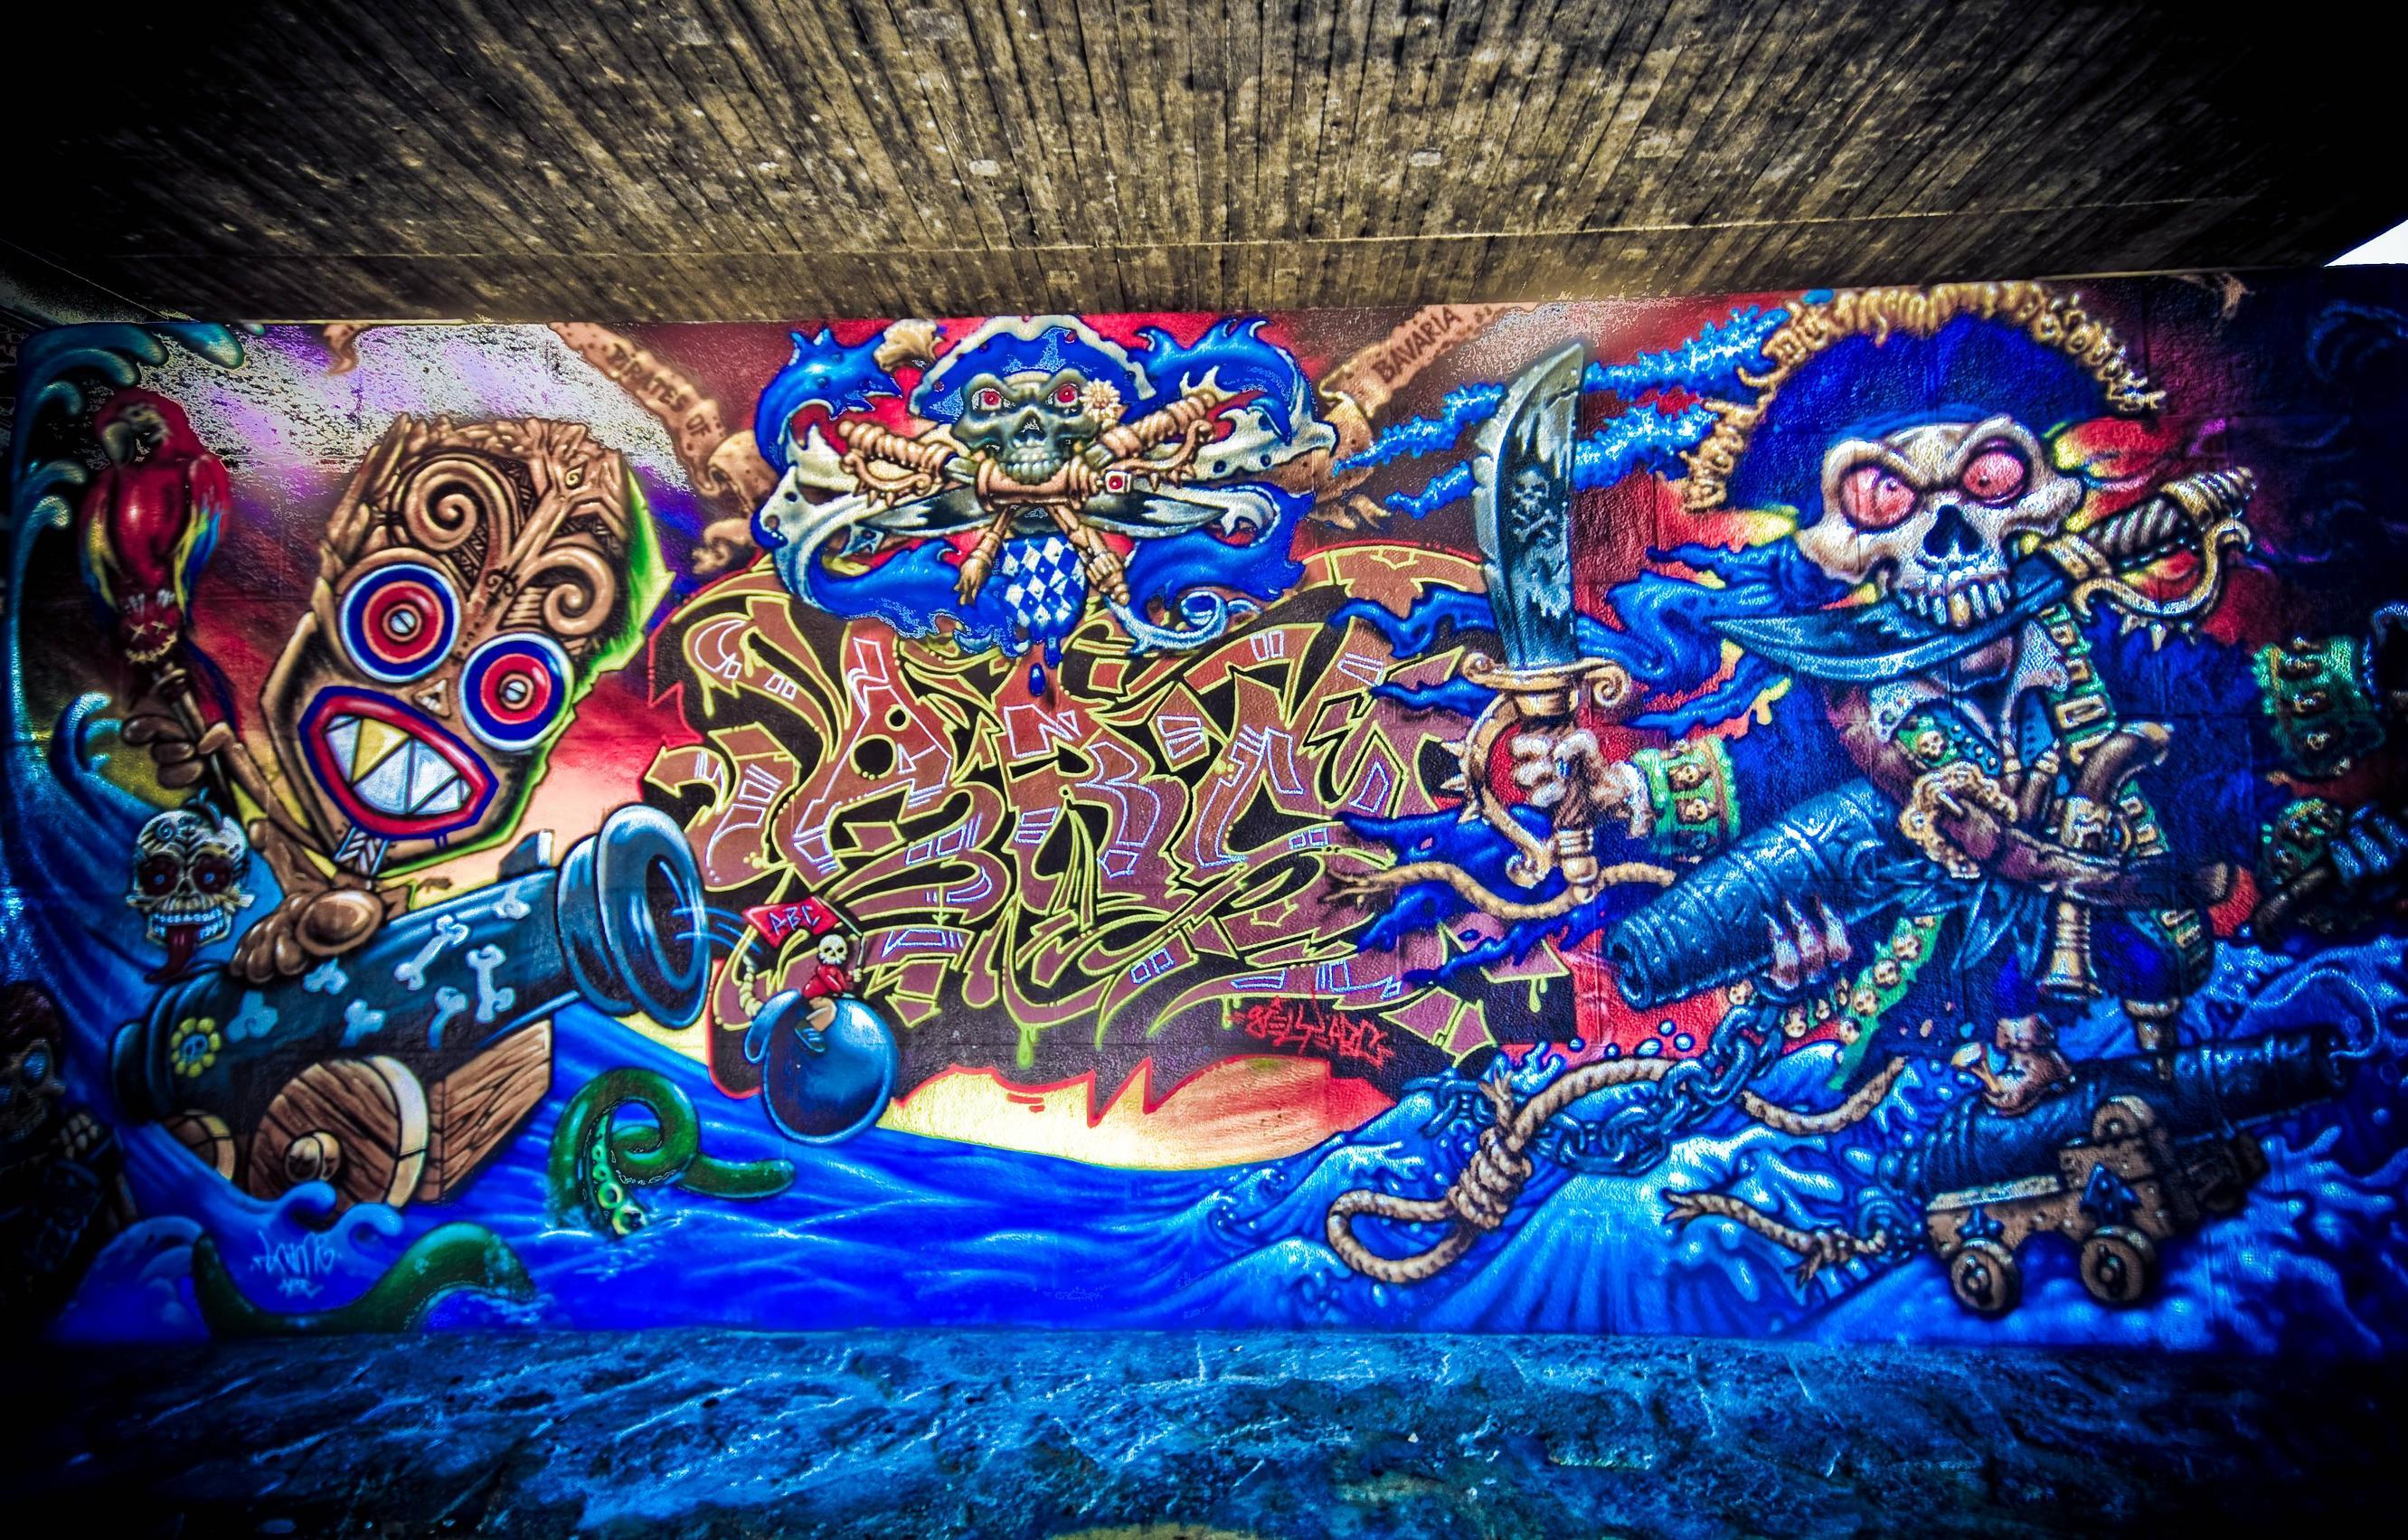 Graffiti HD Wallpaper | Background Image | 2663x1703 | ID:784394 - Wallpaper Abyss